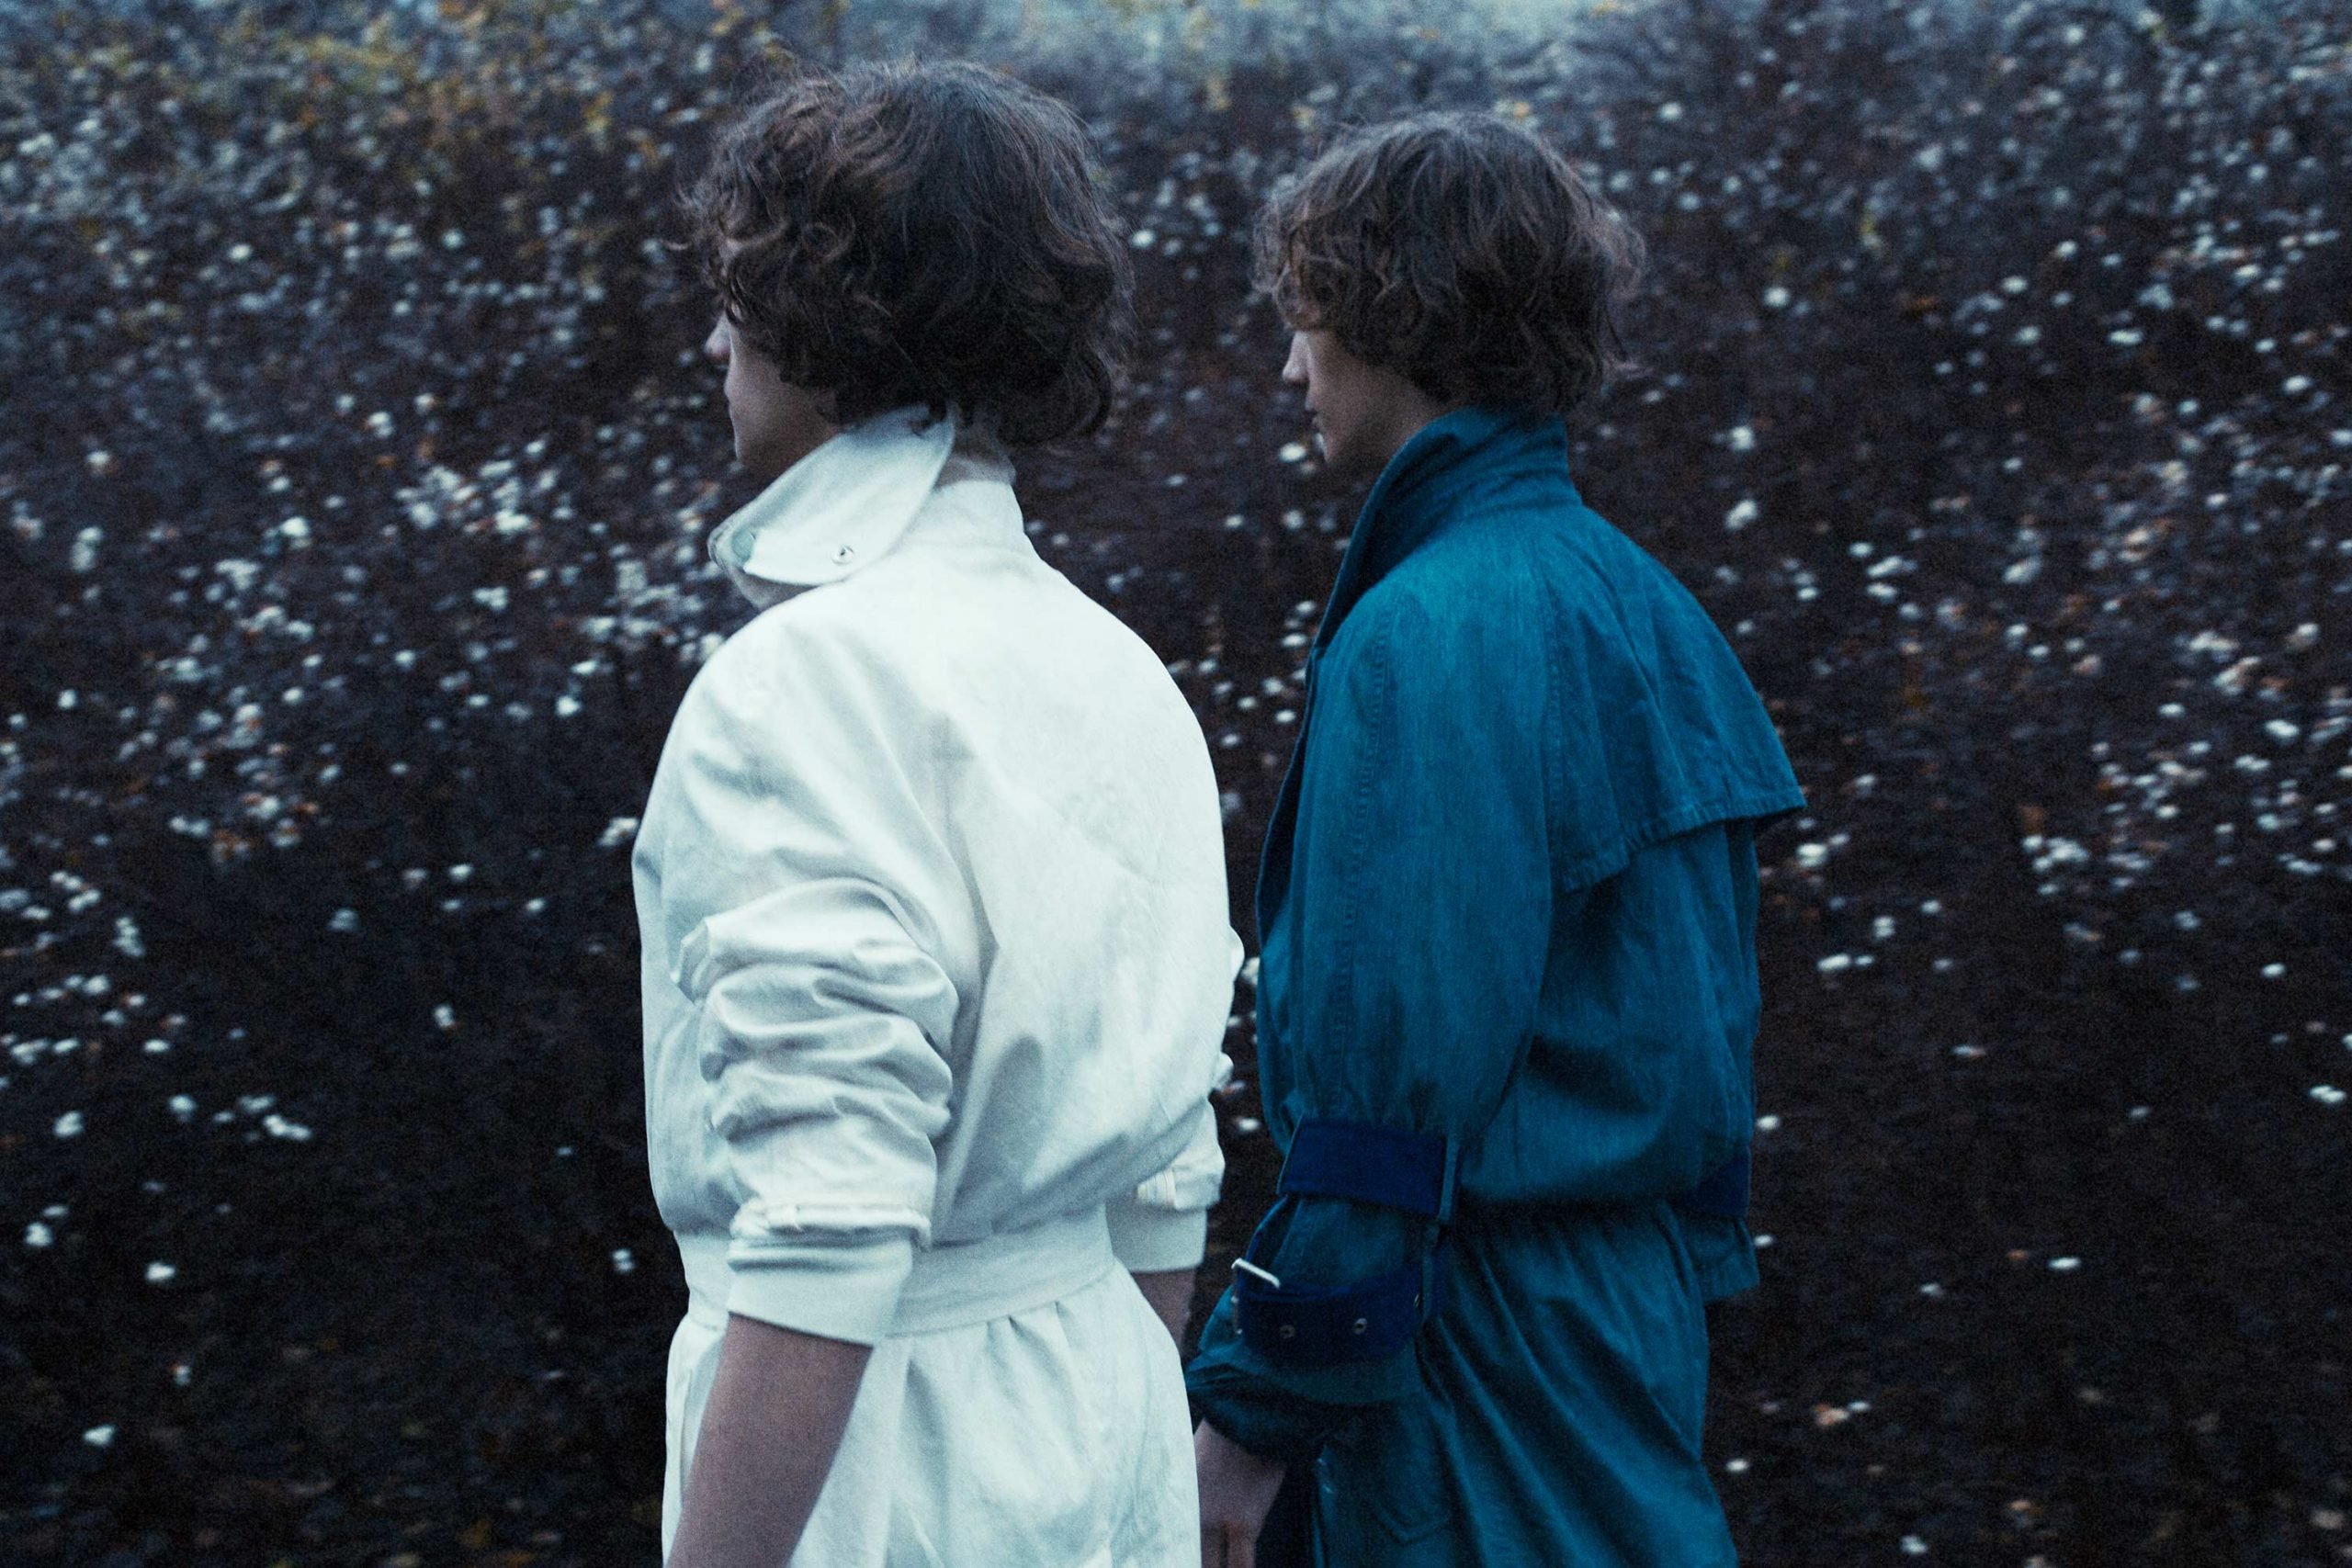 wren-agency-marcus-palmqvist-profile4